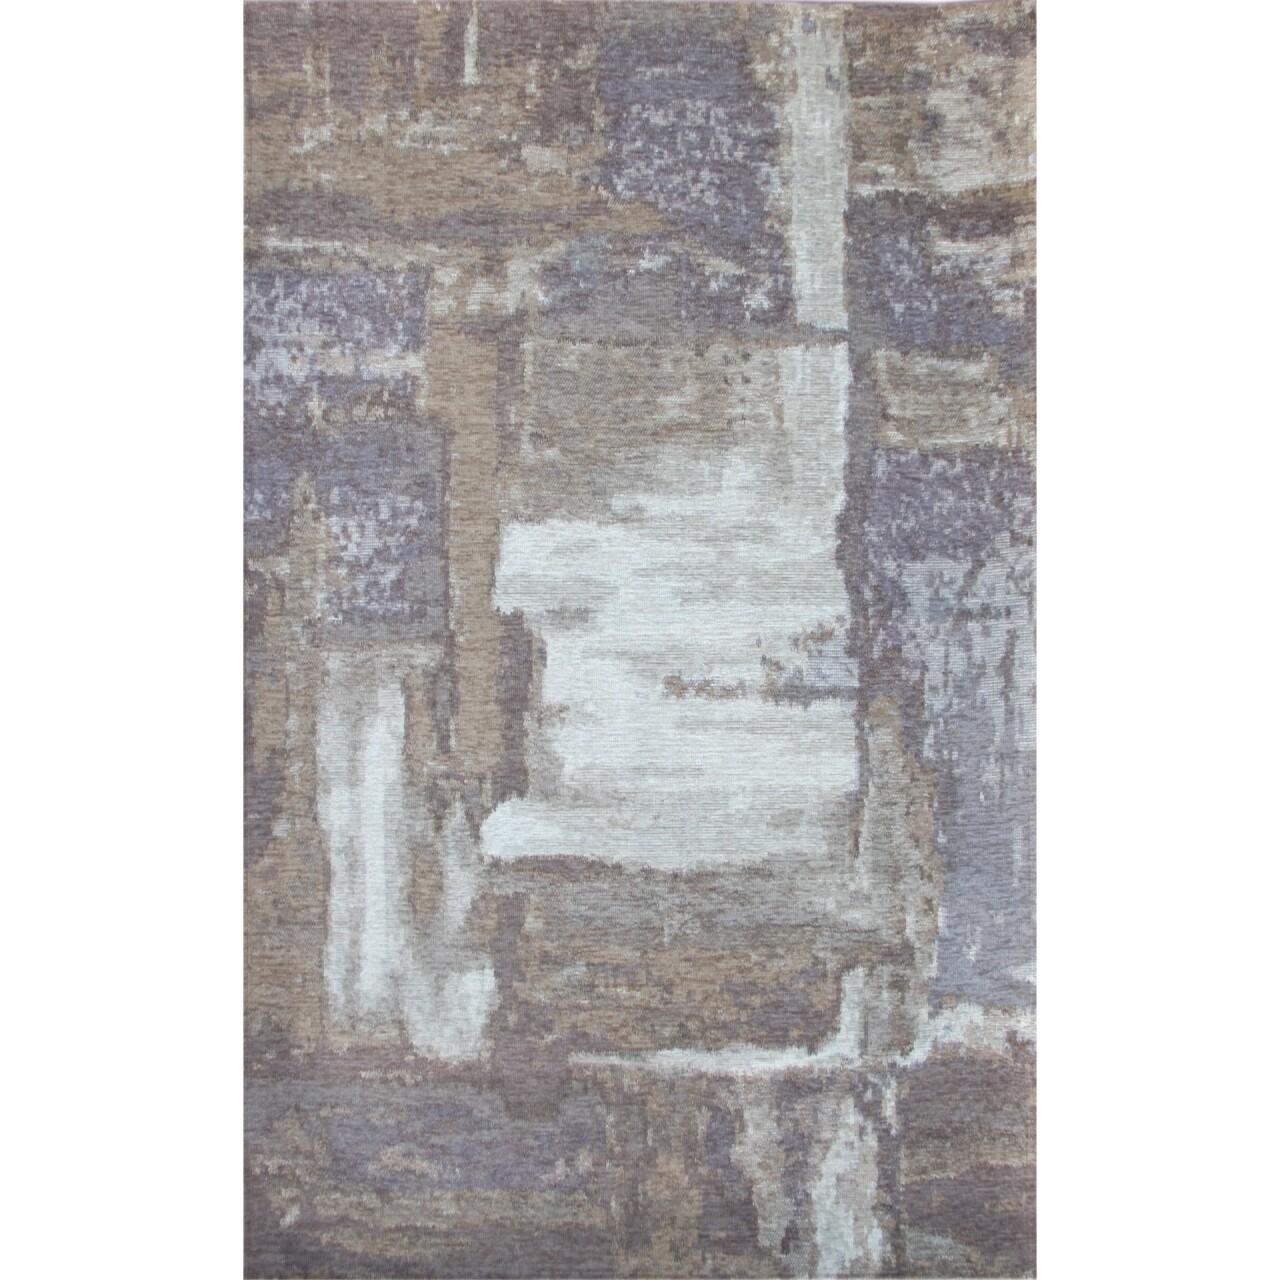 Covor rezistent Eko, SM 01 - Natural XW, 100% acril,  200 x 290 cm